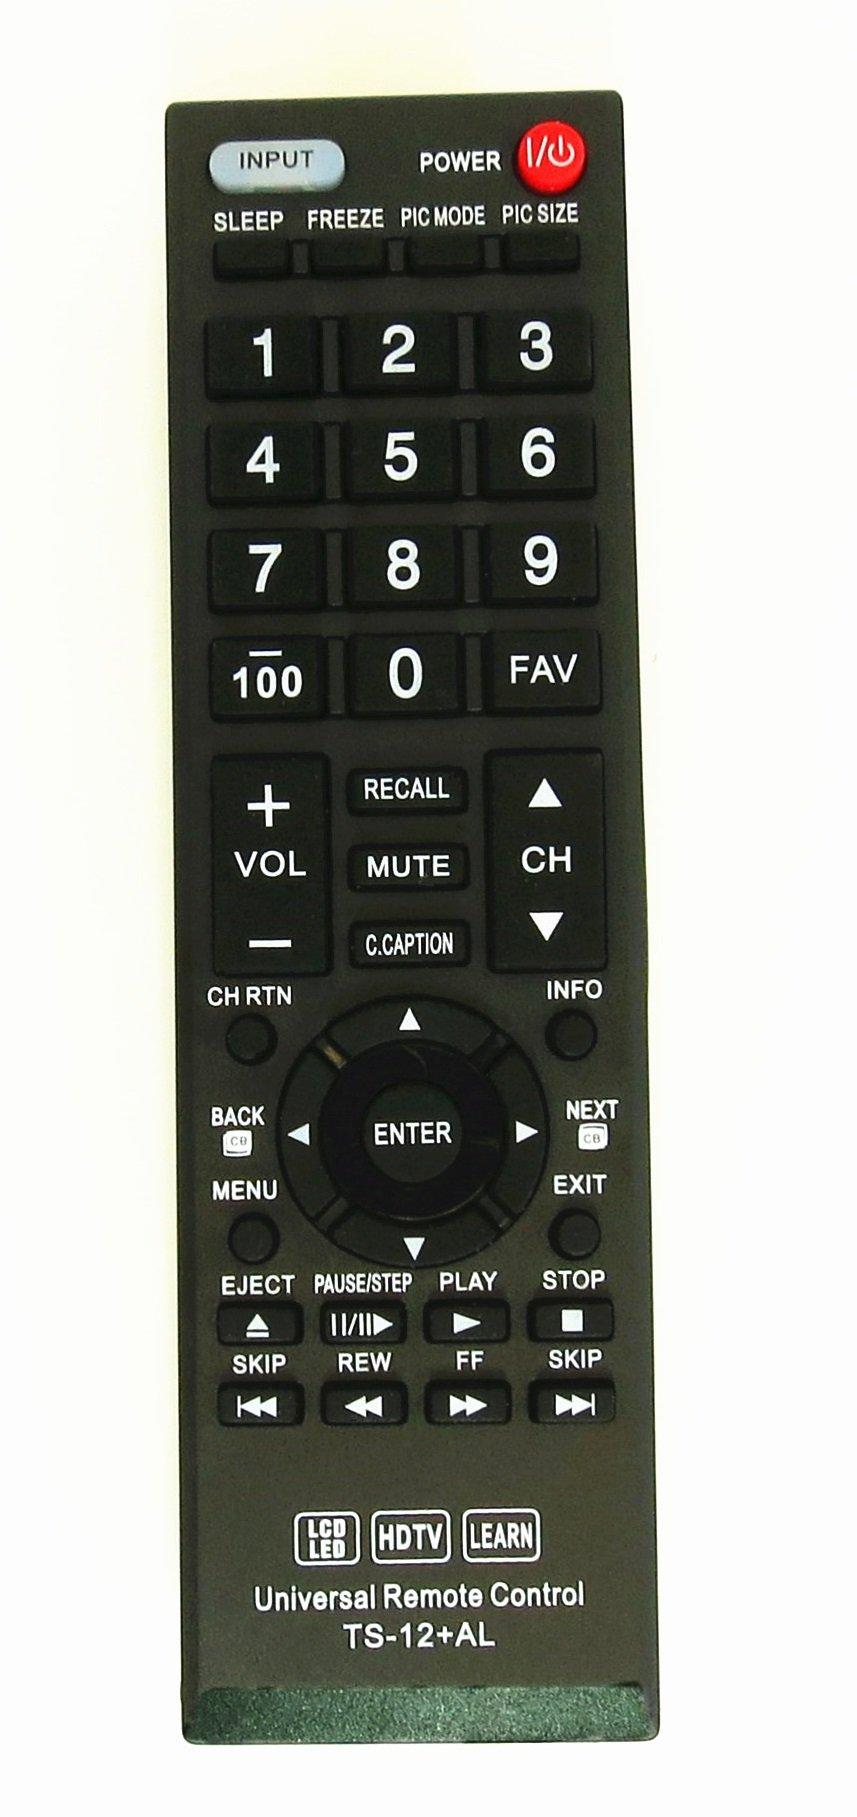 New Toshiba CT-90325 Universal Remote Control for All Toshiba BRAND TV, Smart TV - 1 Year Warranty(TS-12+AL)